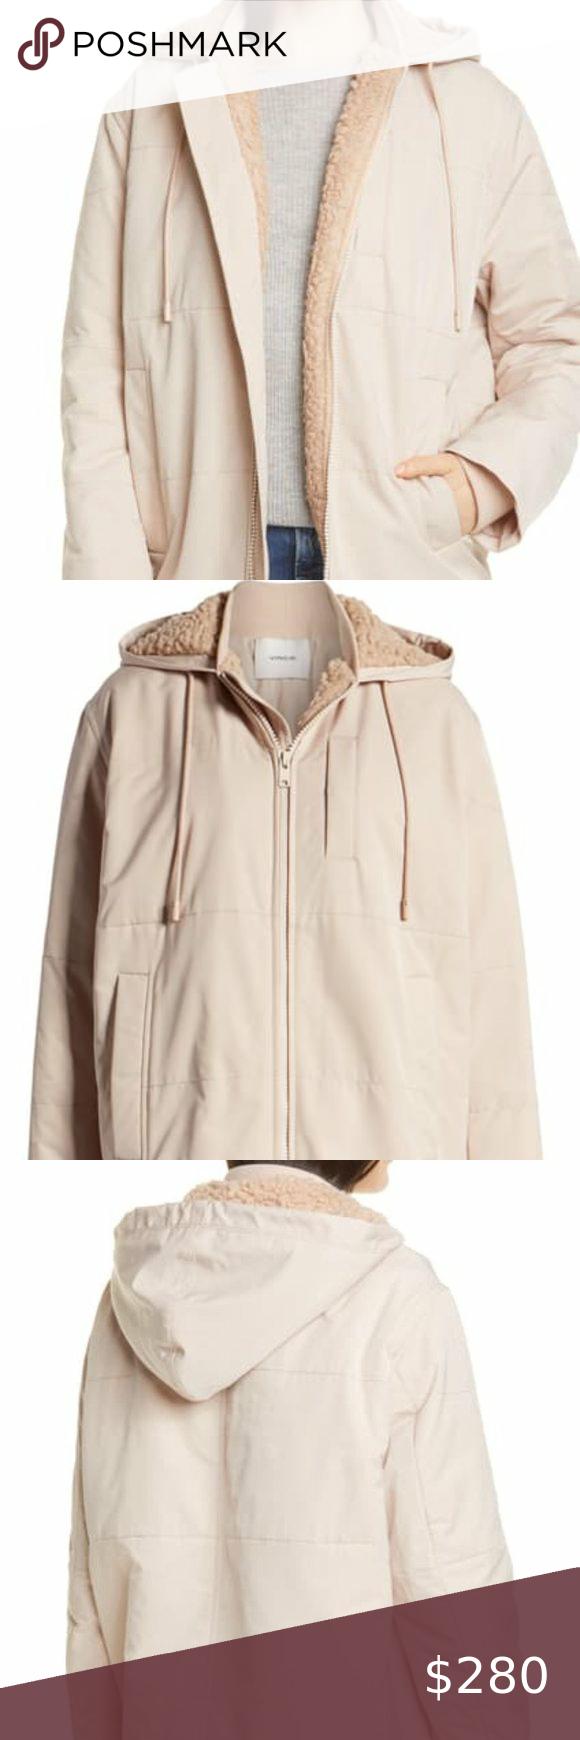 Vince Quilted Faux Shearling Lined Puffer Jacket Coats Jackets Women Faux Fur Trim Coat Winter Jackets Women [ 1740 x 580 Pixel ]